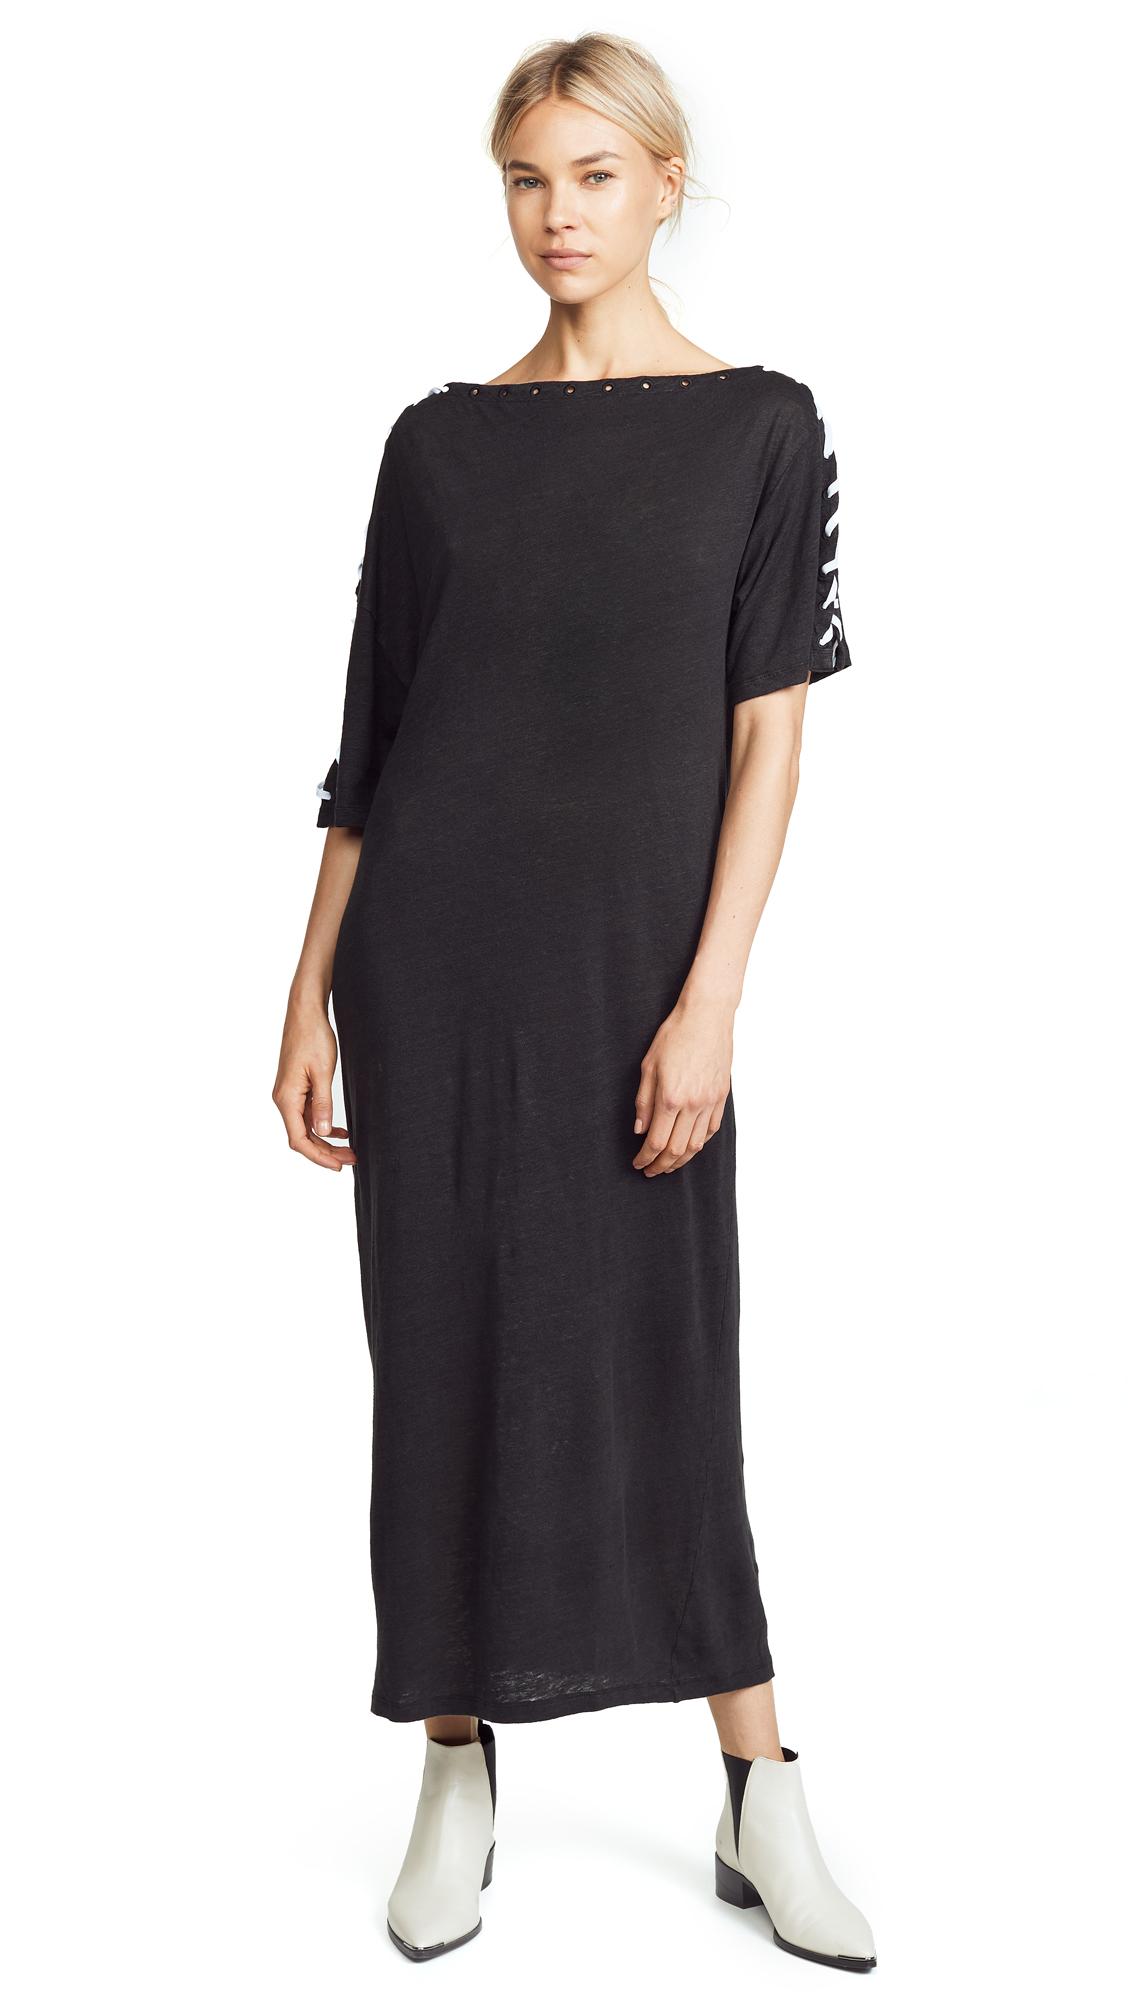 IRO Rapture Dress In Black